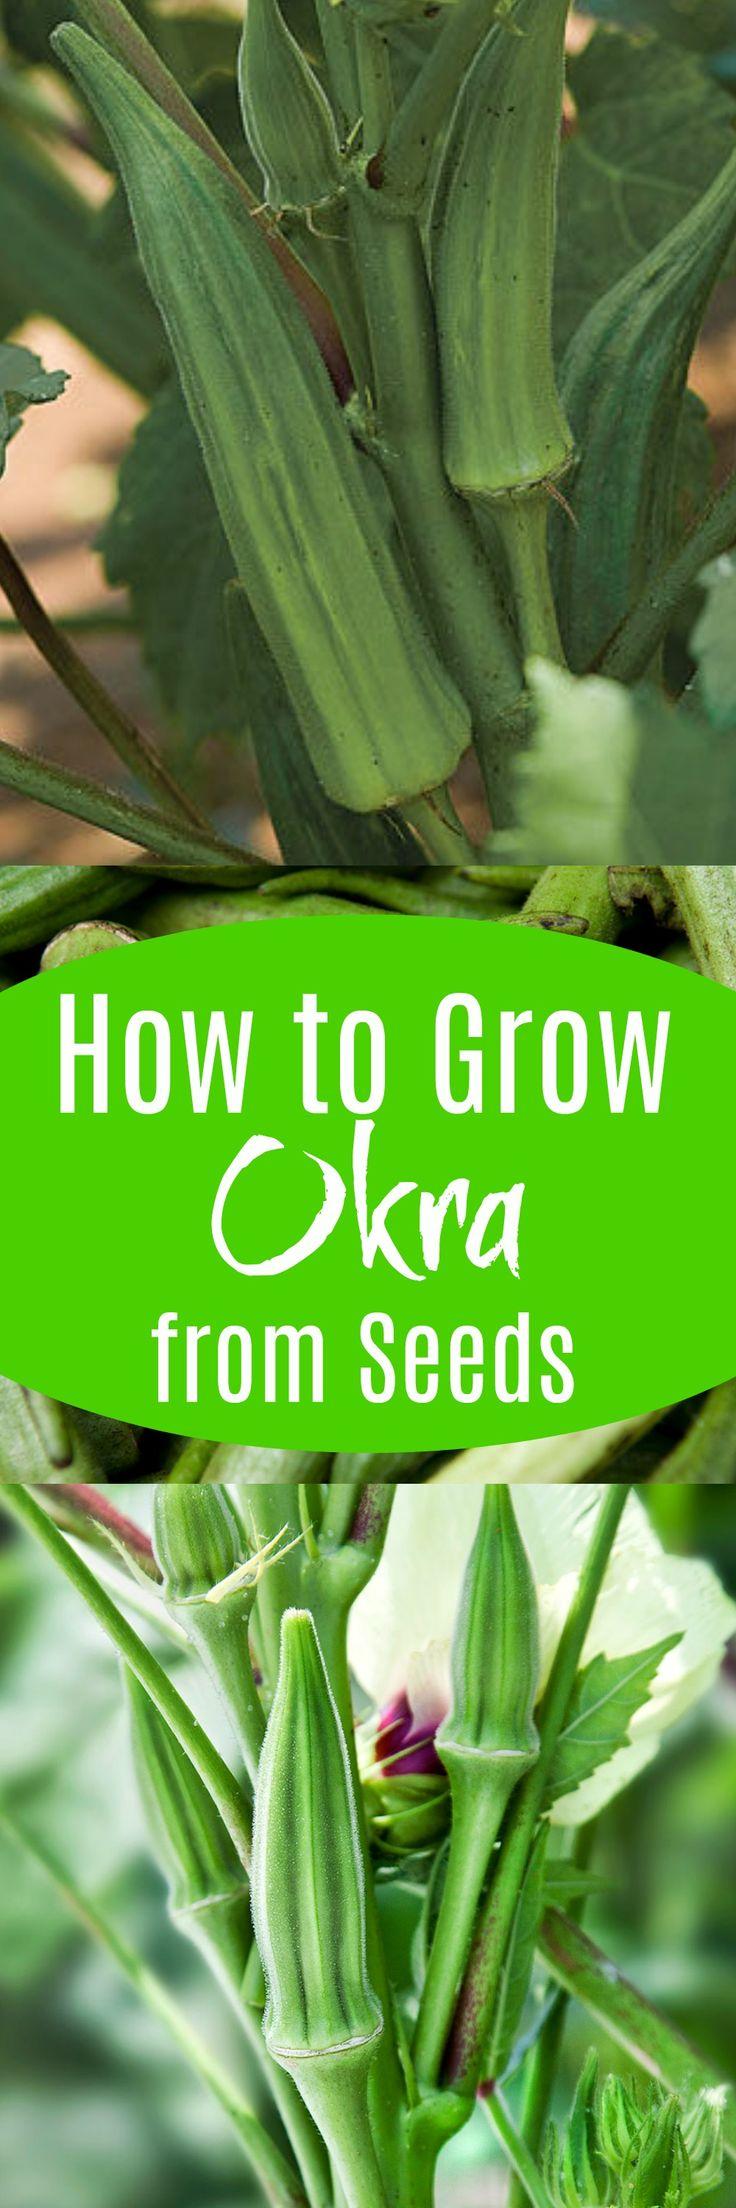 how to best cook okra